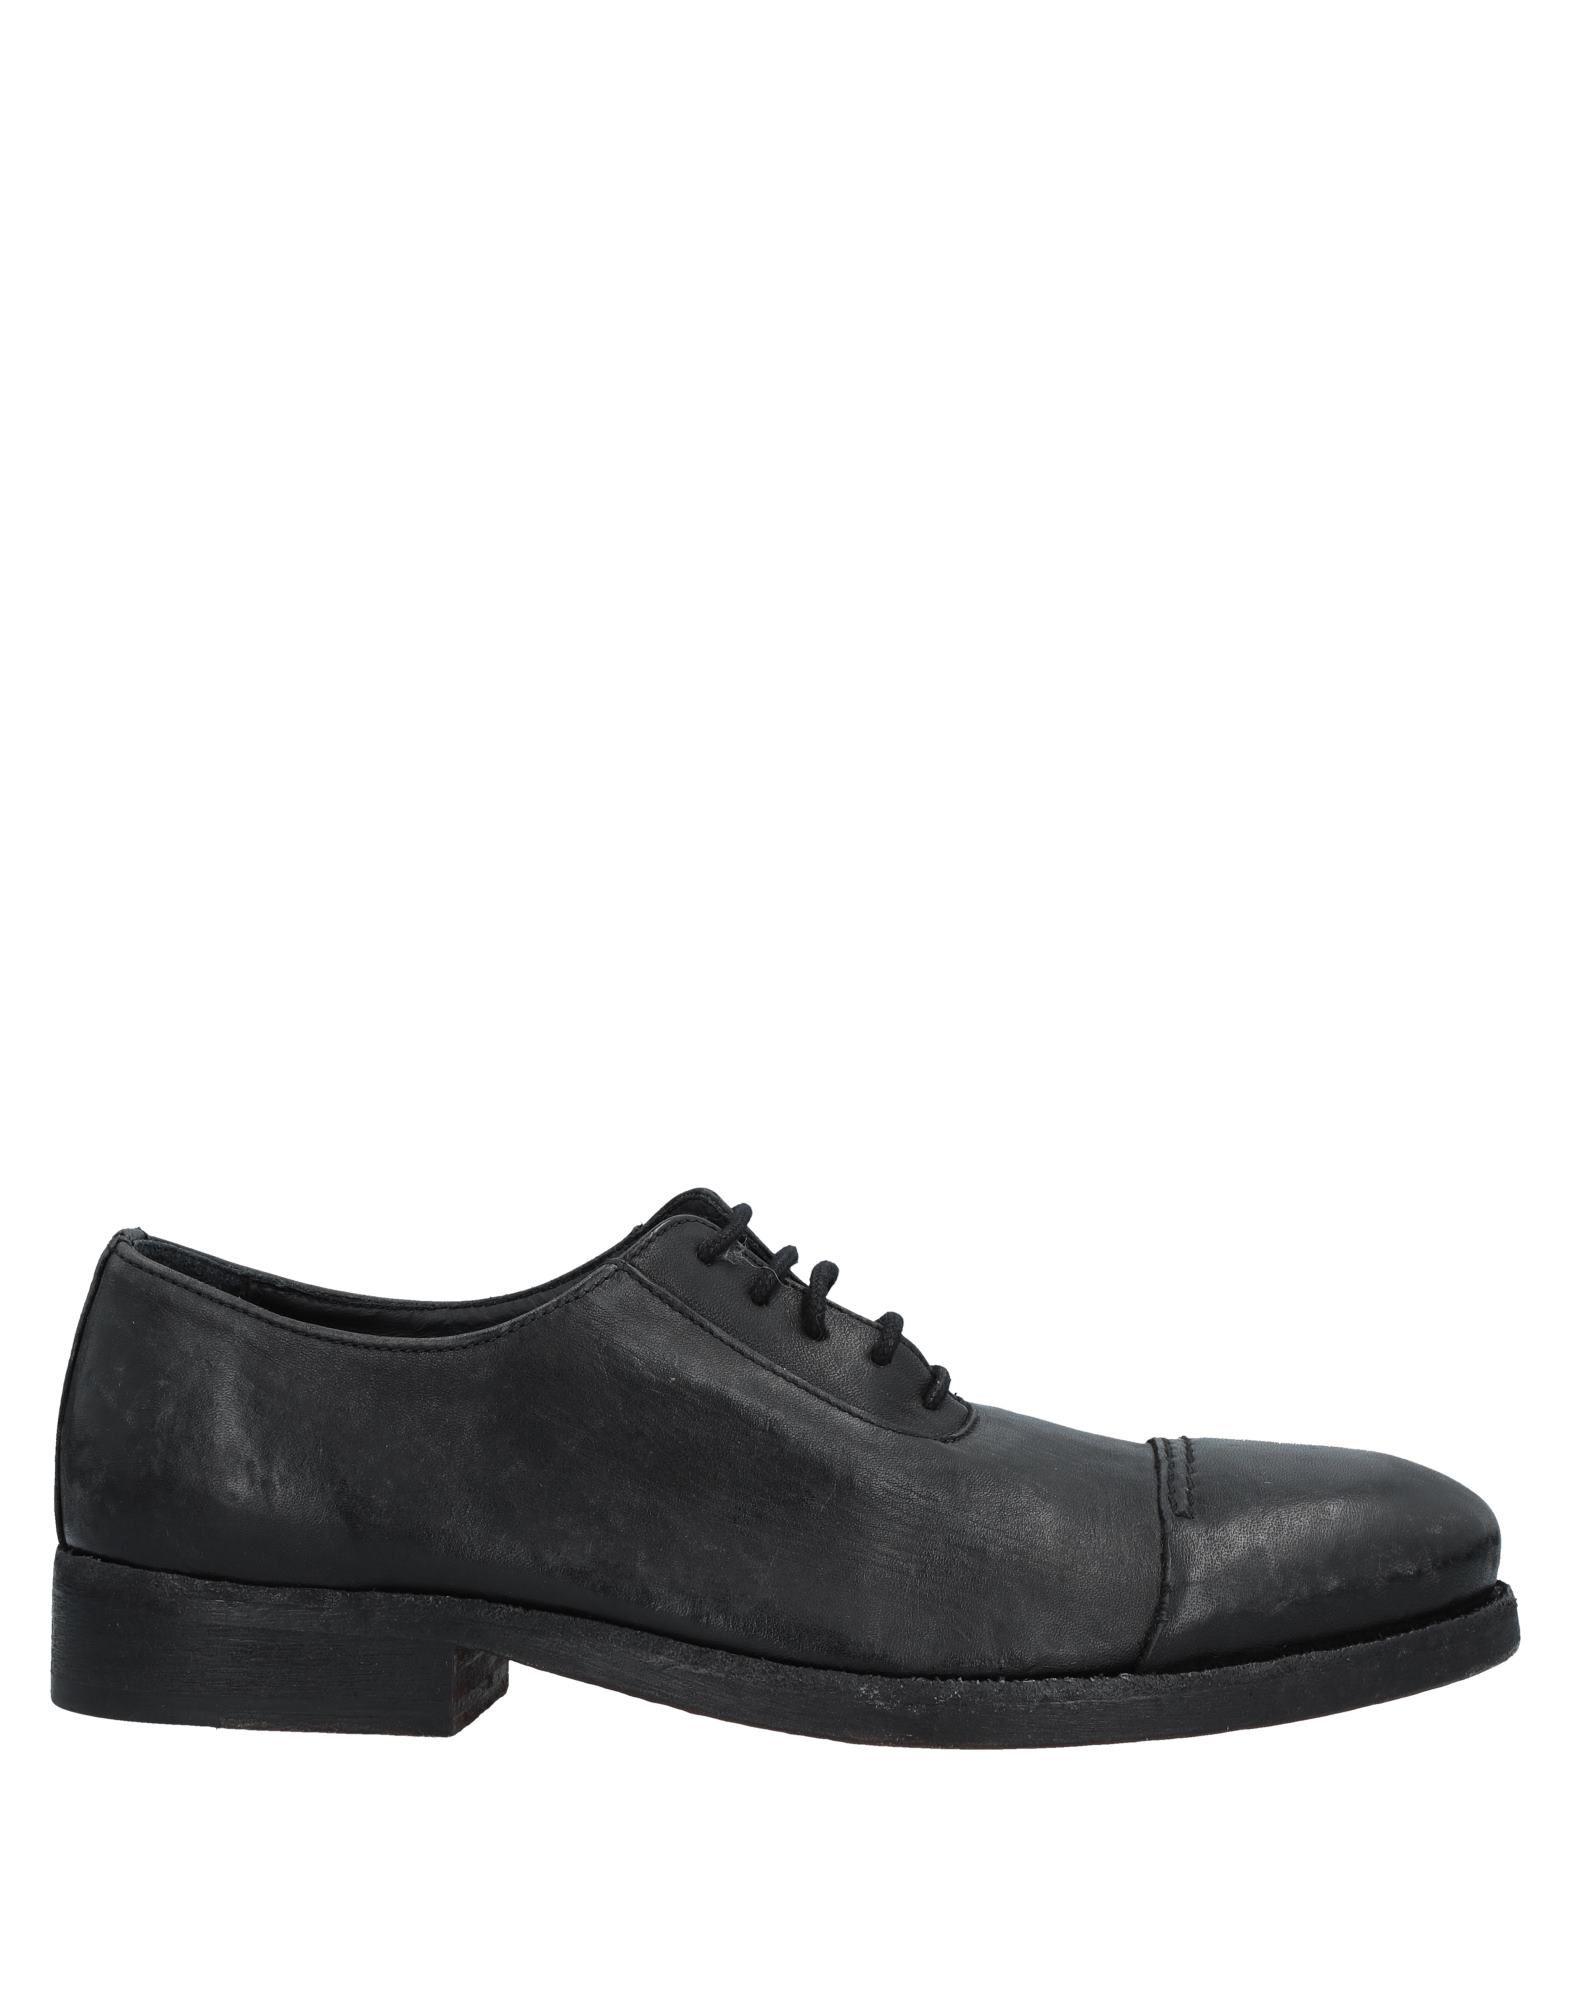 Rabatt echte Schuhe Selected Homme Schnürschuhe Herren  11536668MH